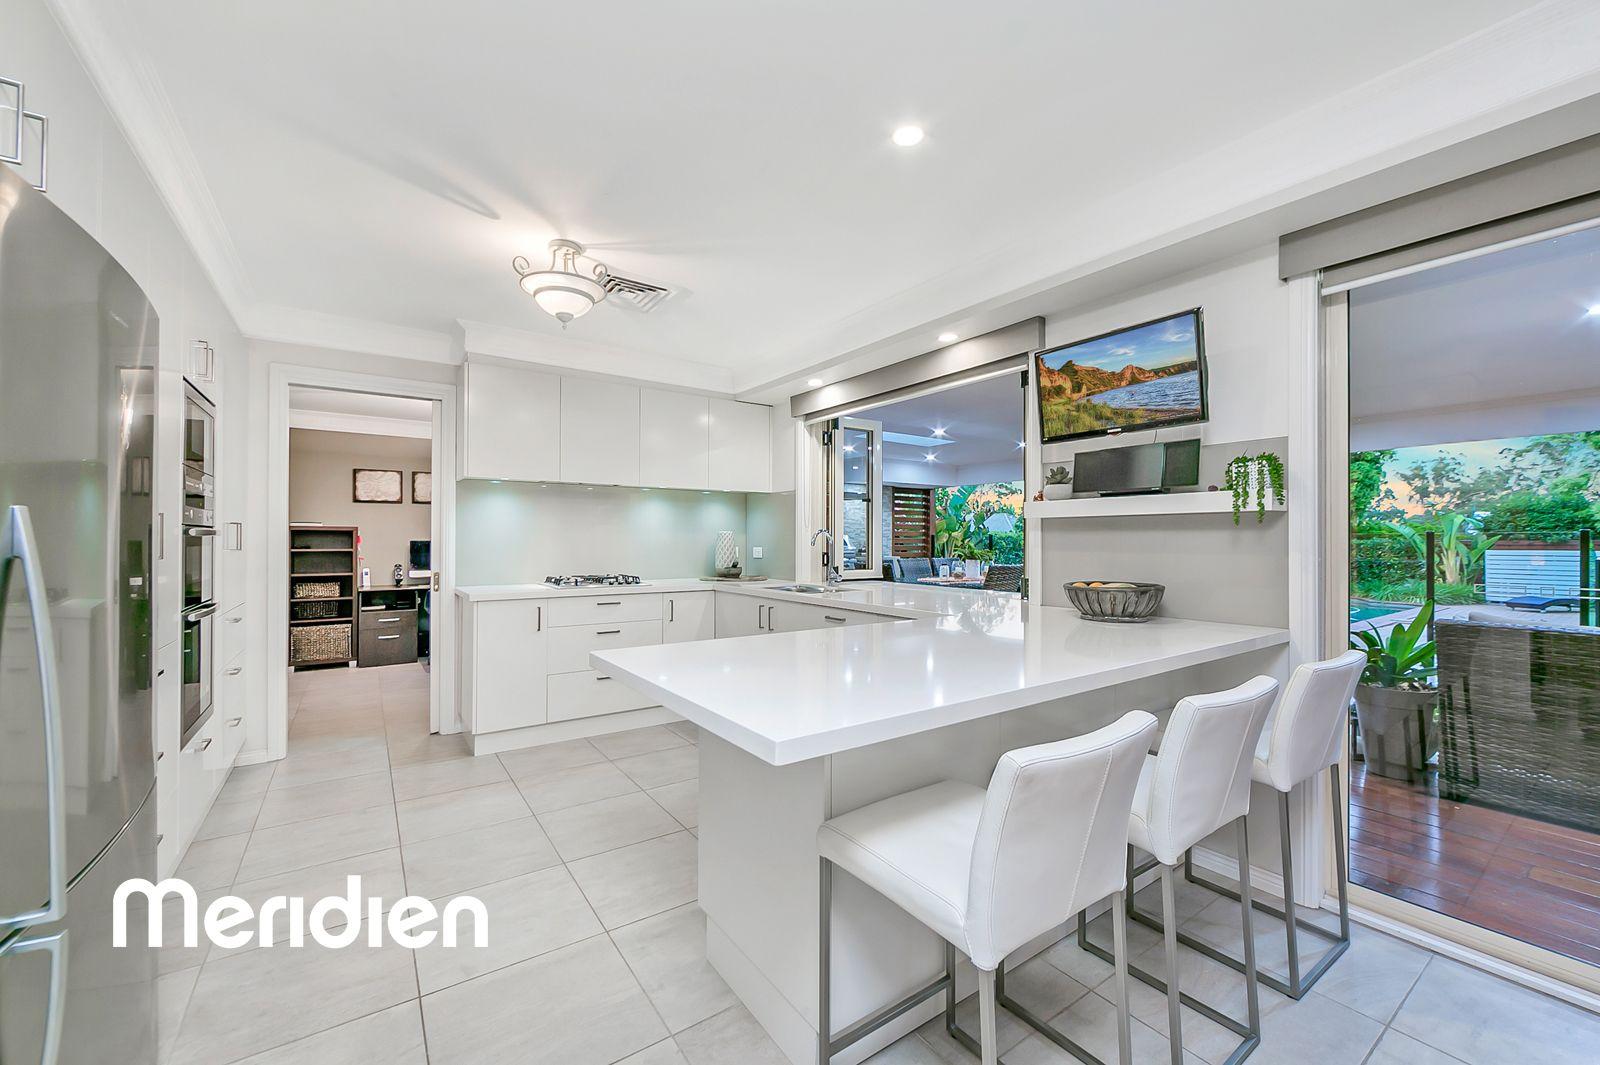 6 Redden Drive, Kellyville NSW 2155, Image 2